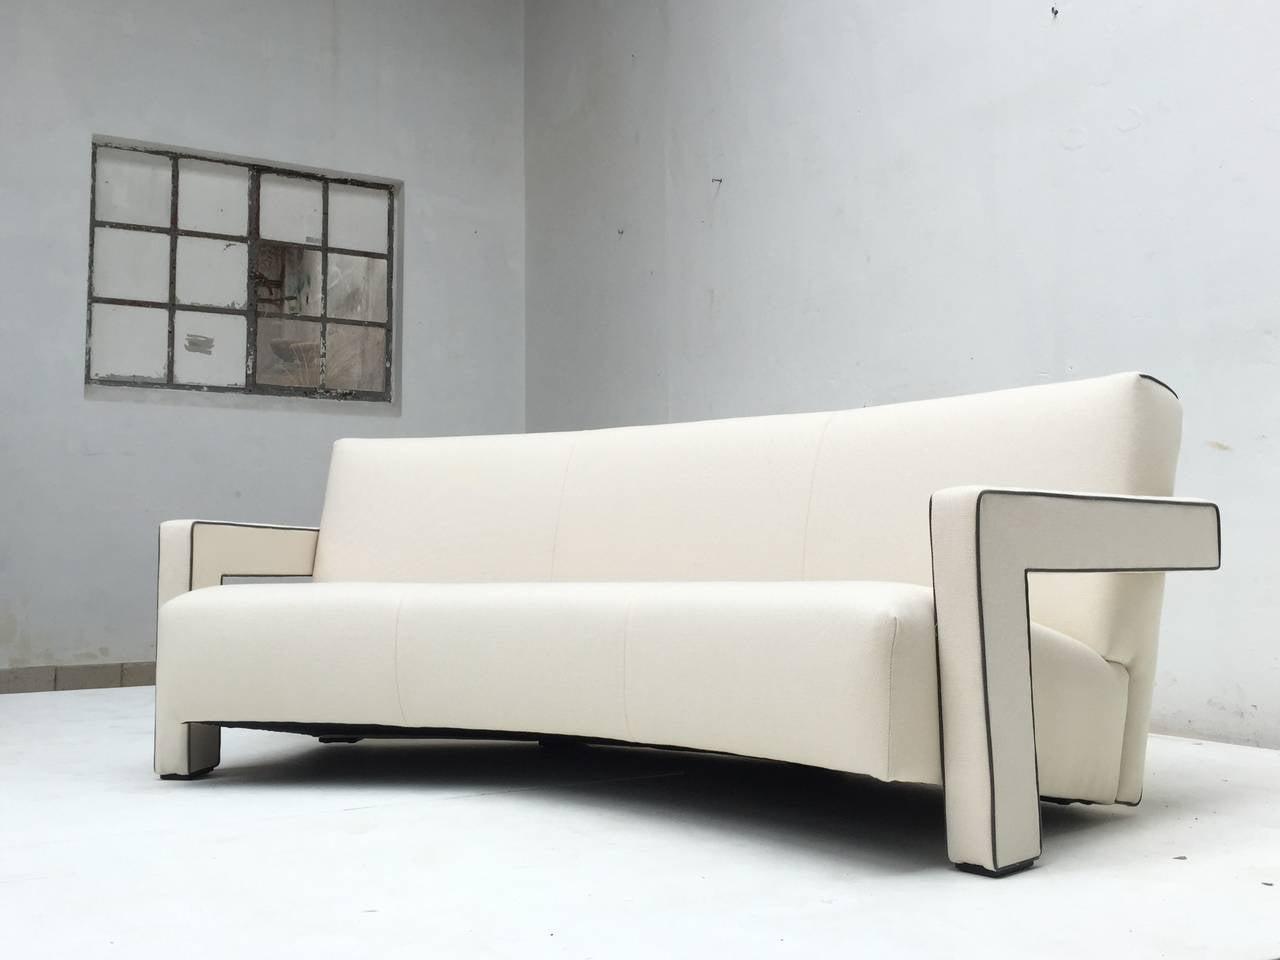 Stunning de stijl gerrit rietveld utrecht 39 sofa cassina circa 1988 at 1stdibs - Sofa stijl jaar ...